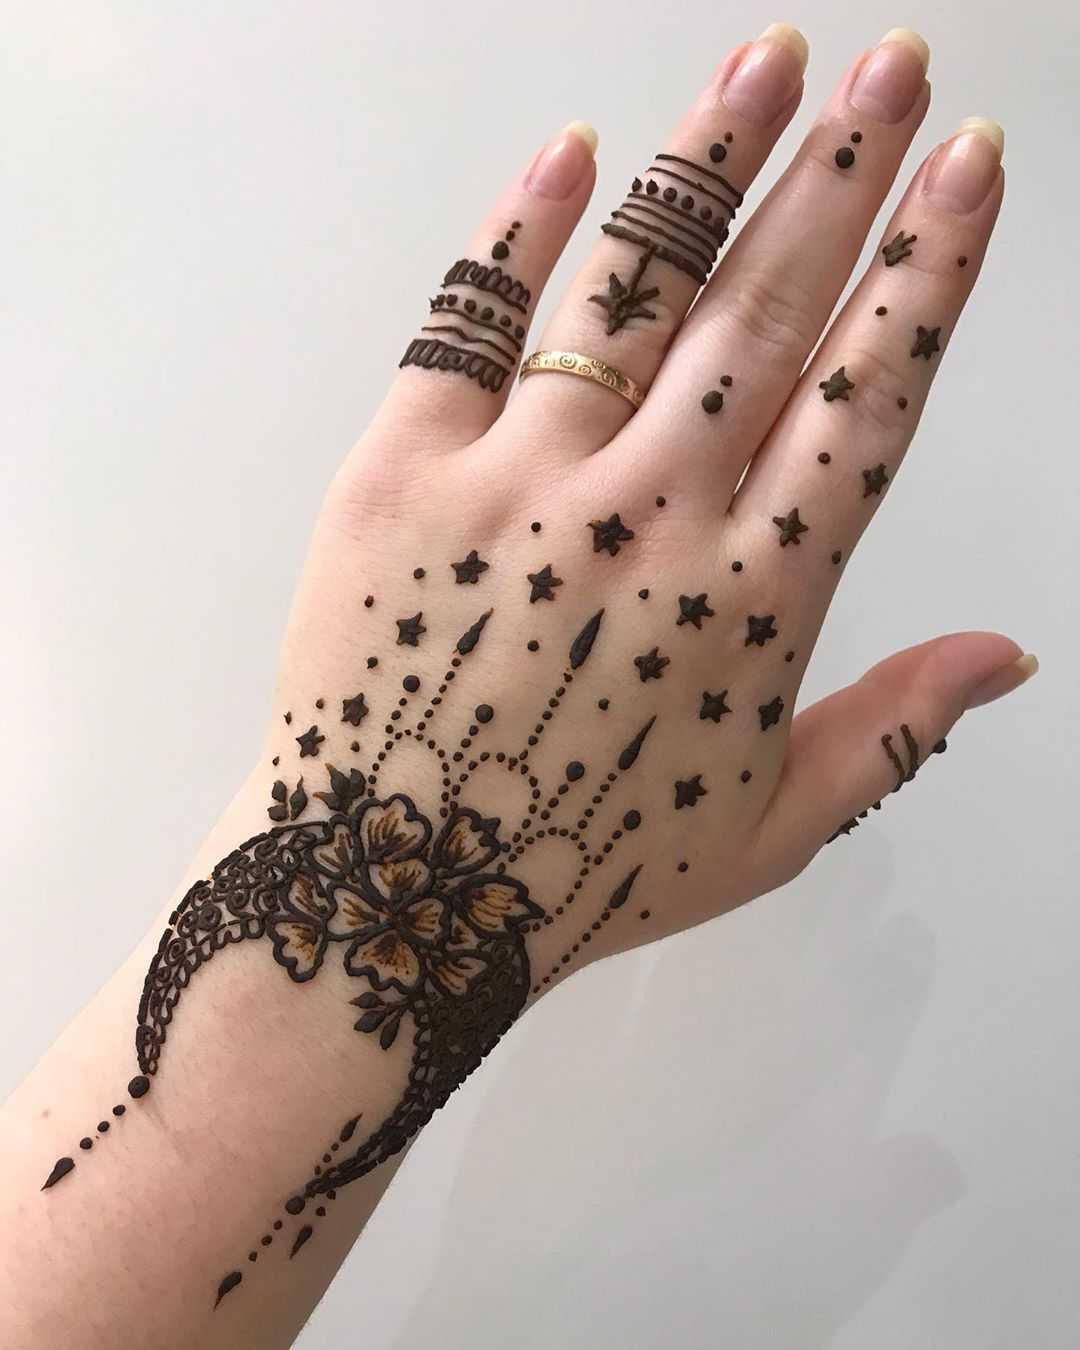 25+ Beautiful Eid Mehndi Designs 2019 - Images & Videos